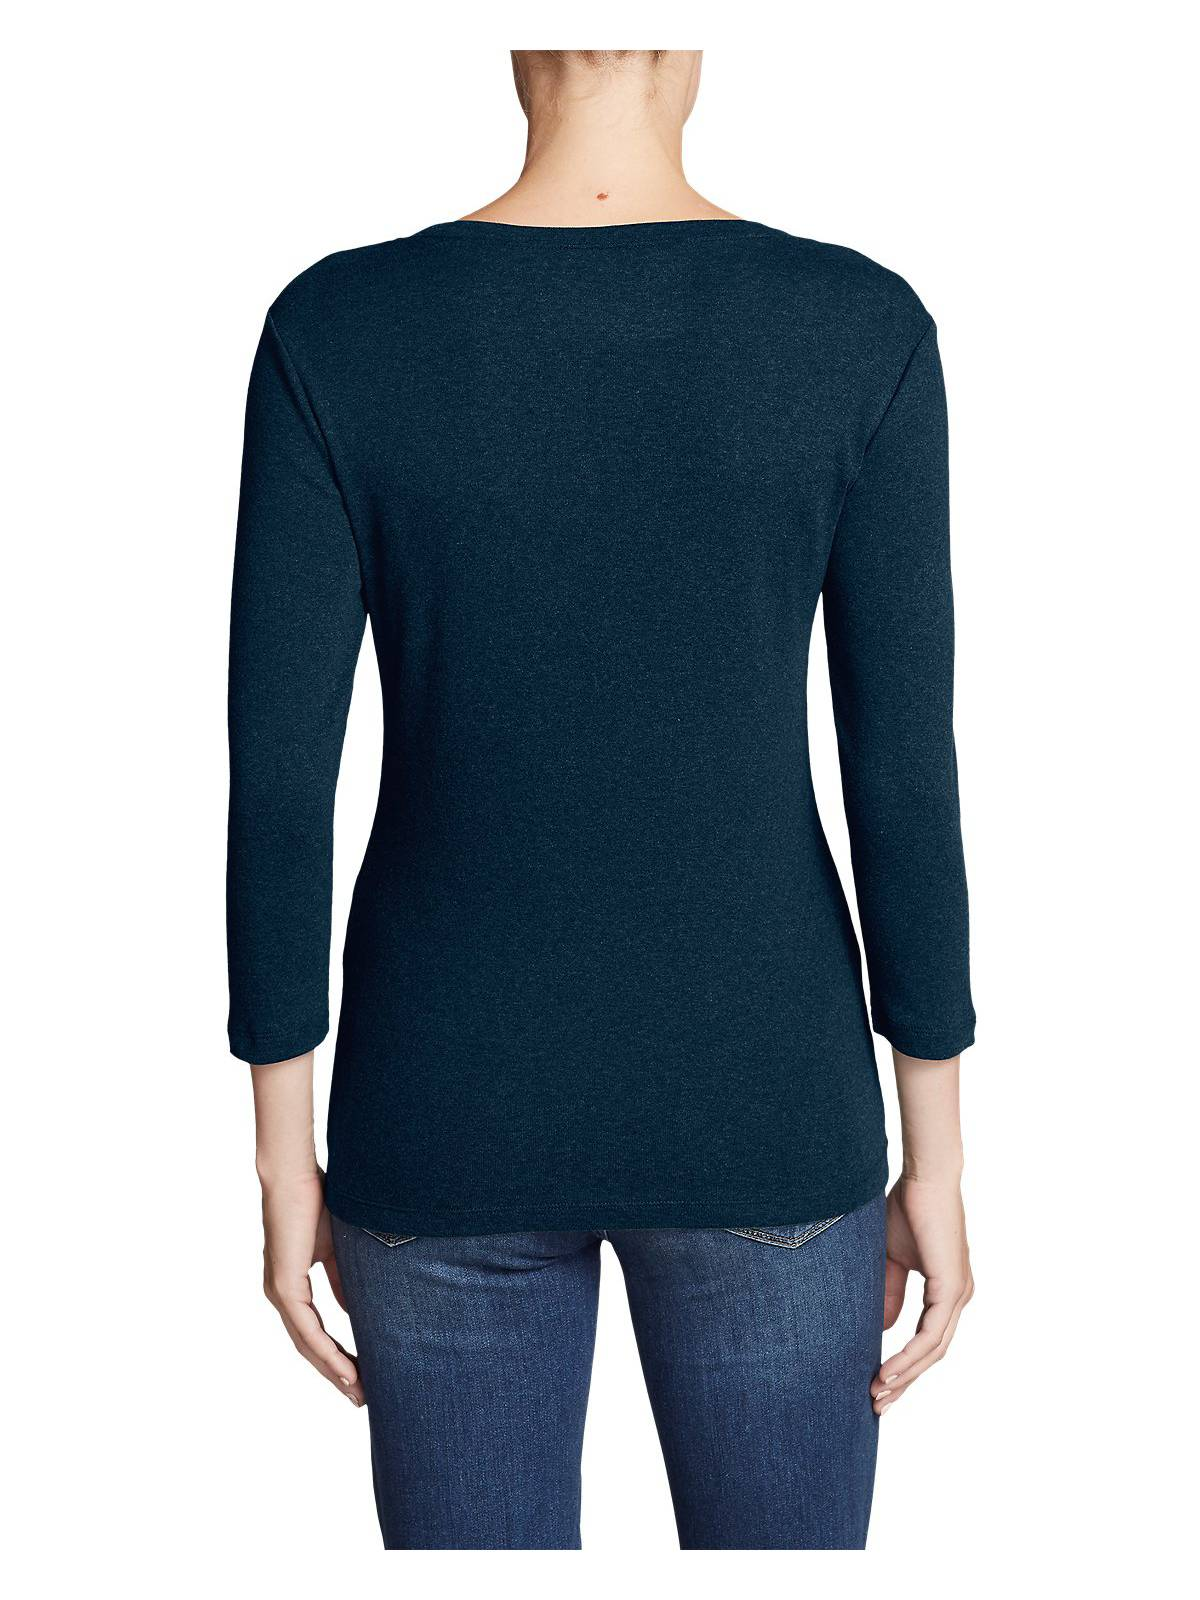 Eddie-Bauer-Women-039-s-Favorite-3-4-Sleeve-Scoop-Neck-T-Shirt thumbnail 18